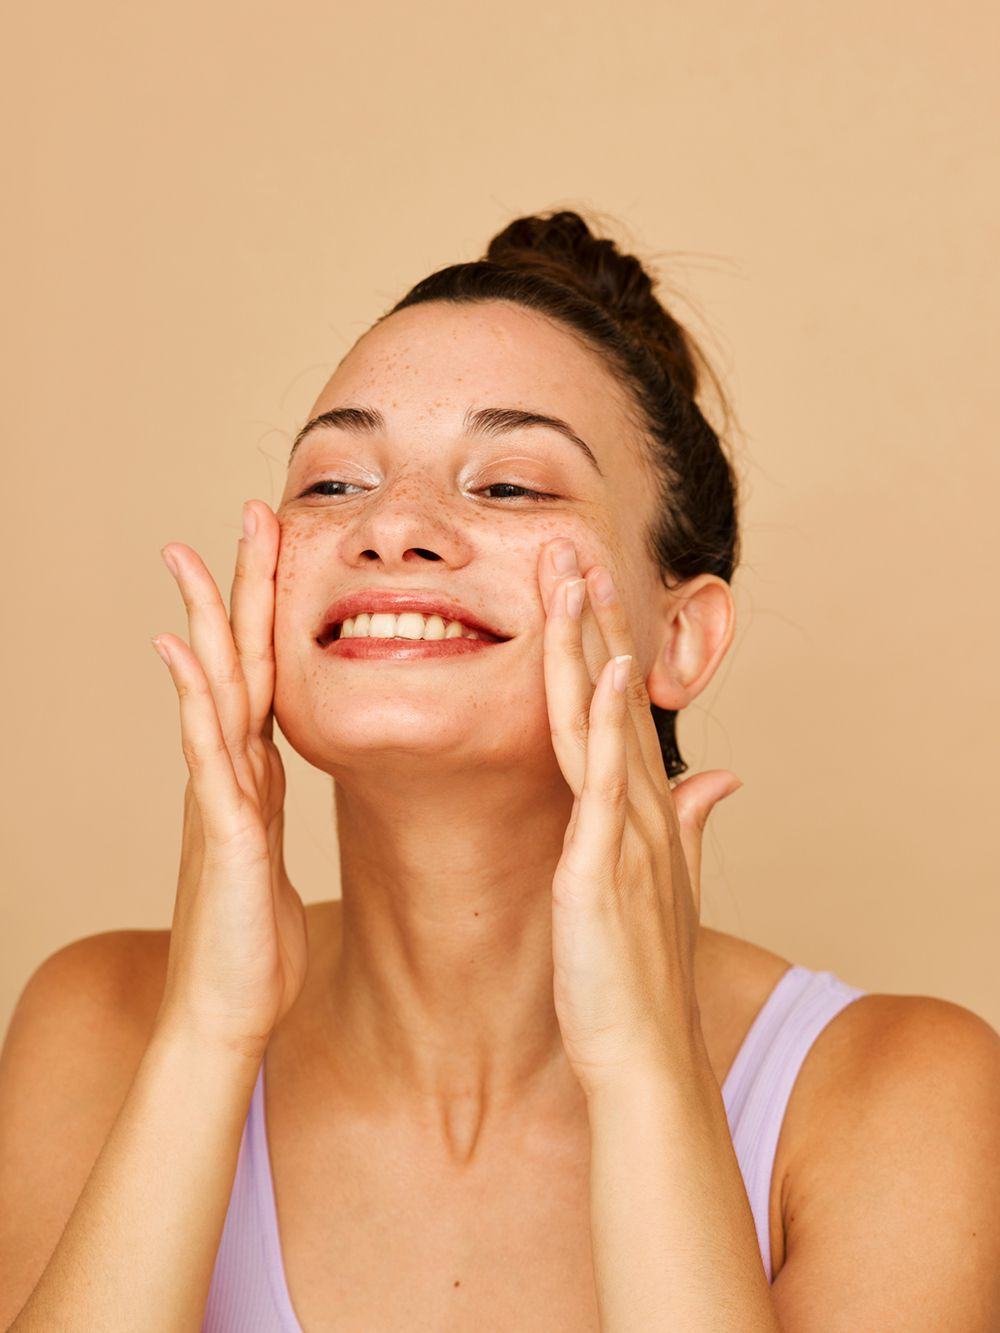 happy person using lite moisturizer